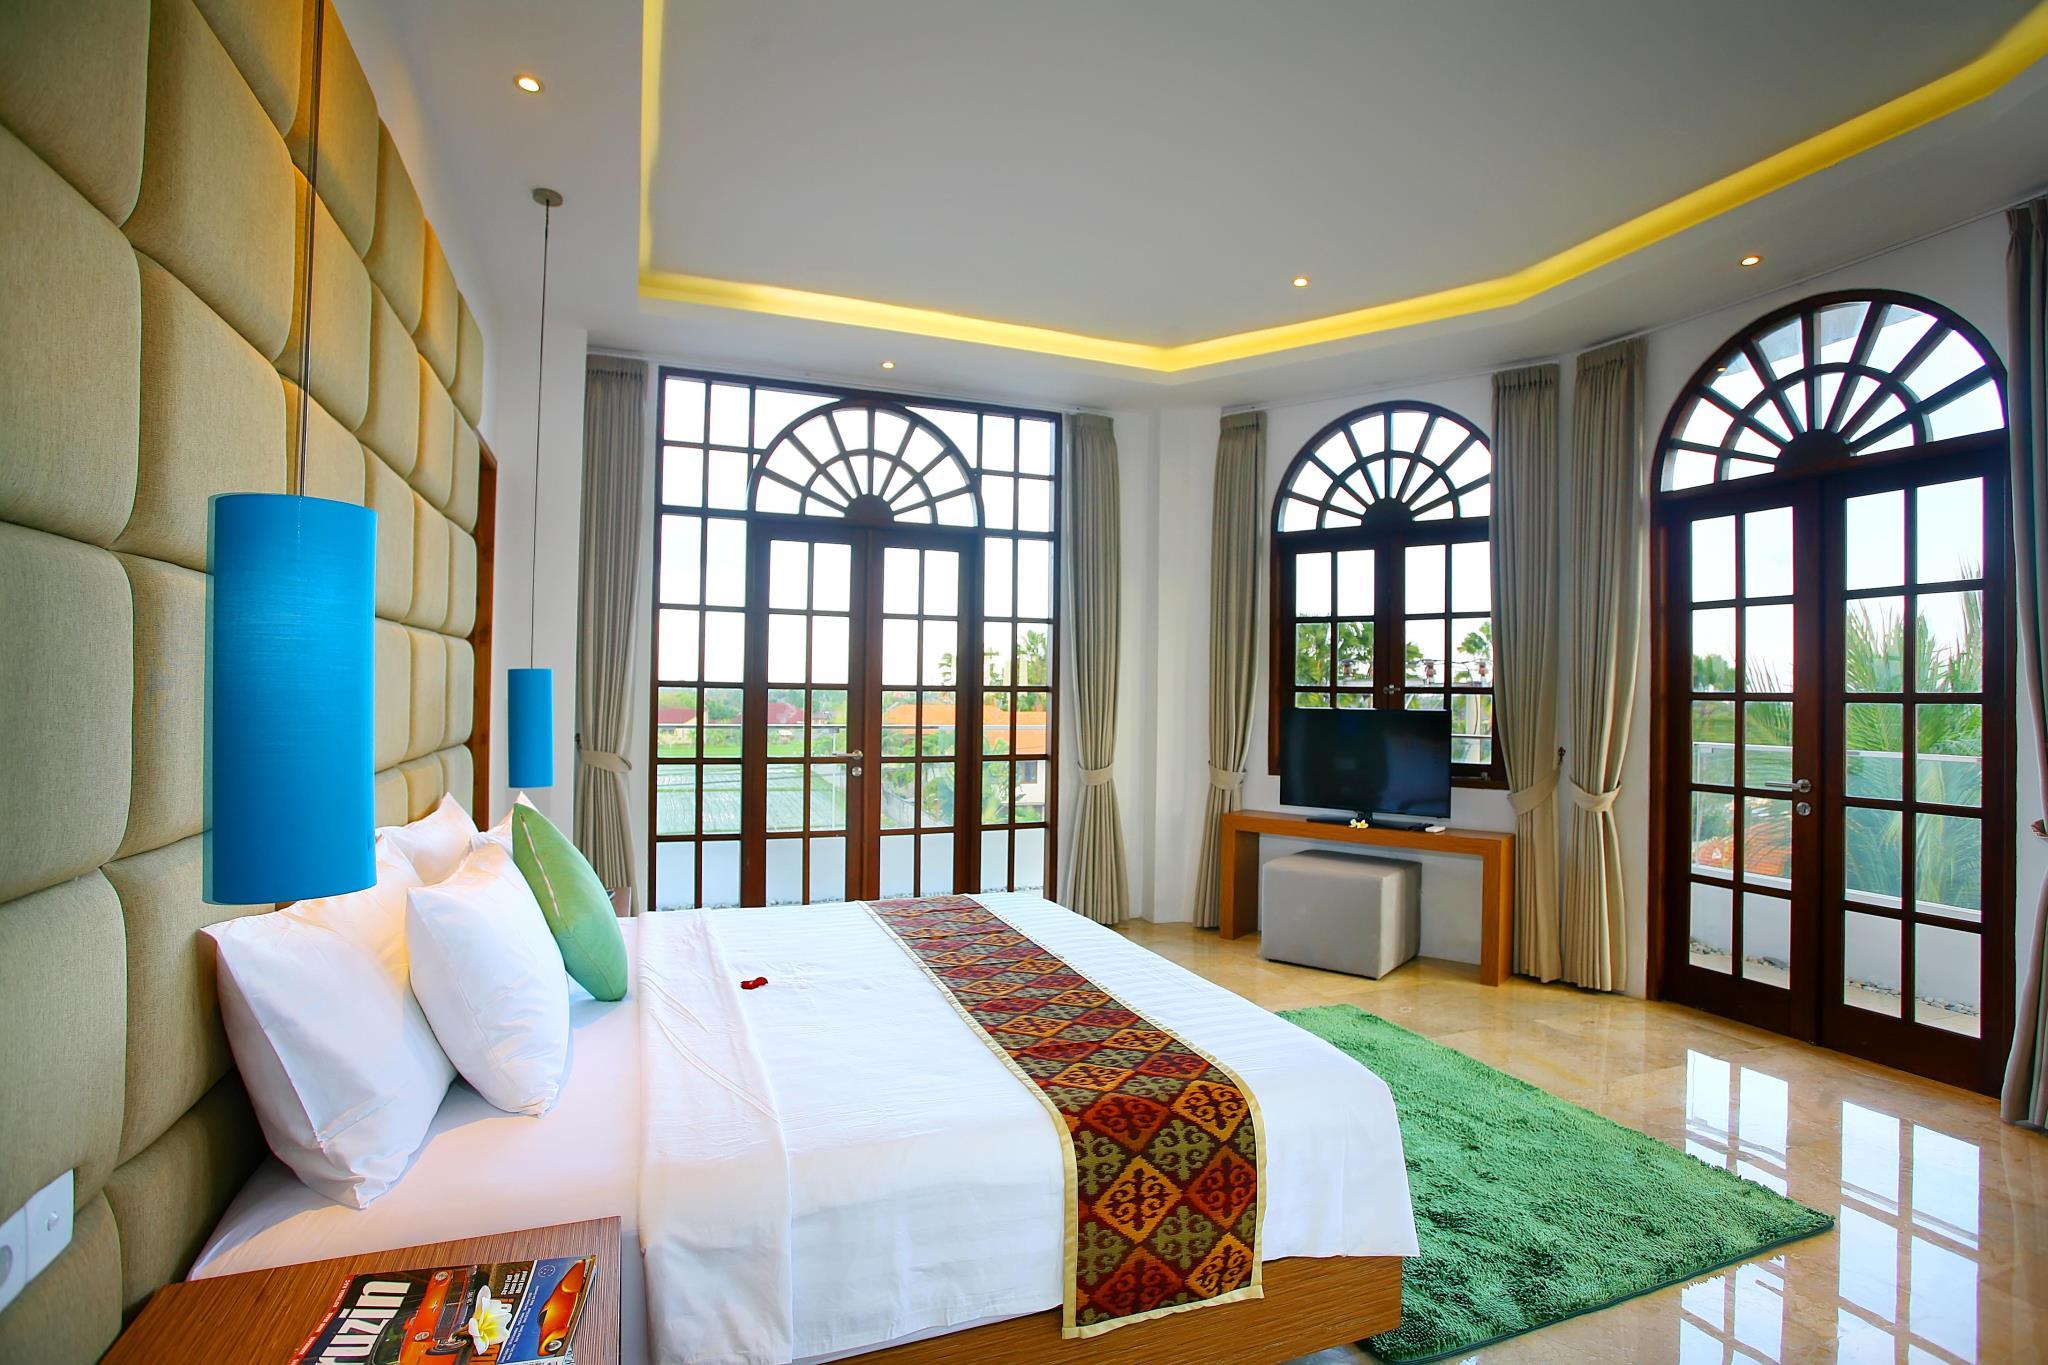 Canggu Rooftop Villas by Bali Family Hospitality